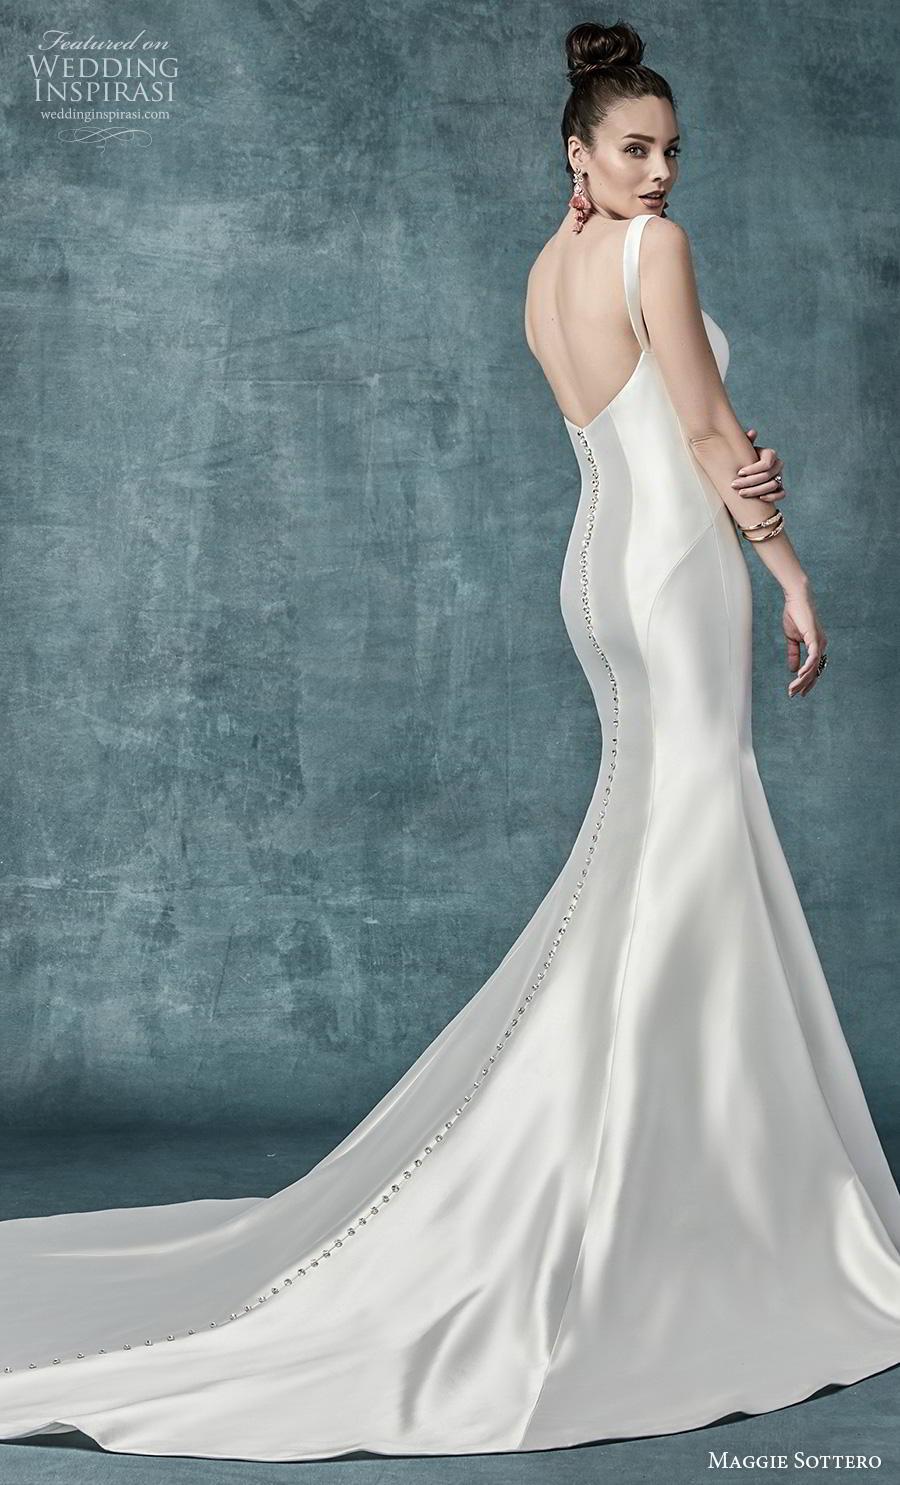 maggie sottero spring 2019 bridal sleeveless with strap diamond neckline simple minimalist satin elegant mermaid wedding dress mid back chapel train (20) bv